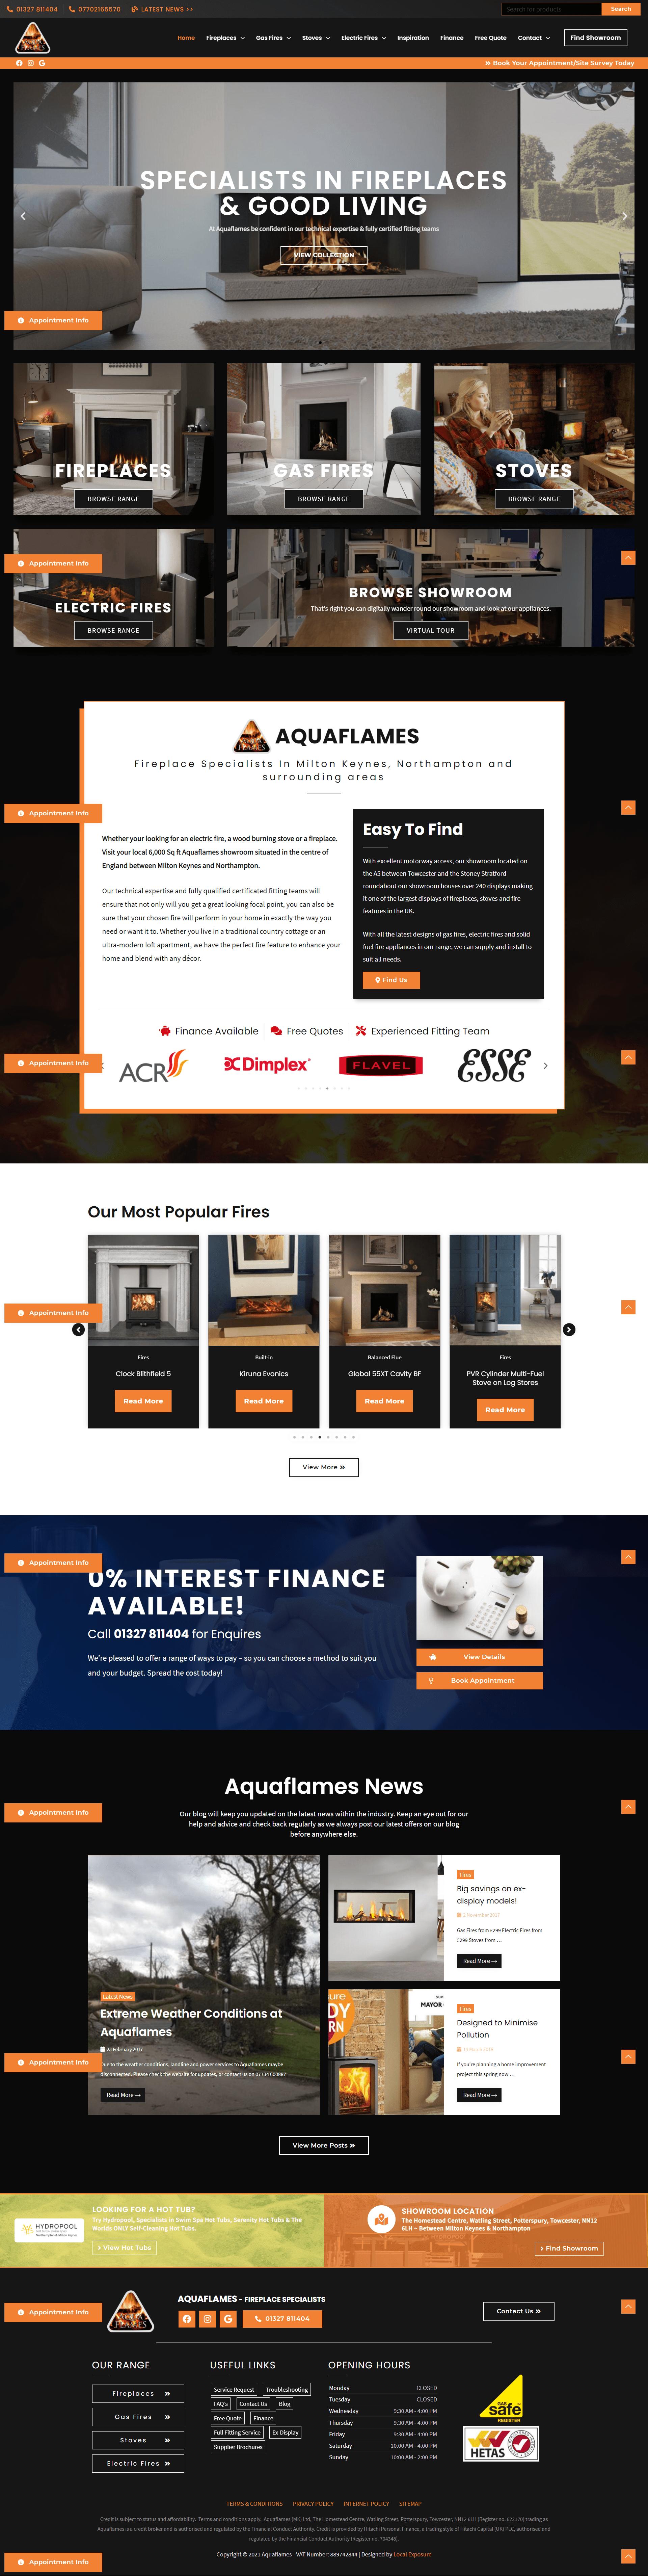 Fireplace Showroom Web Design Example